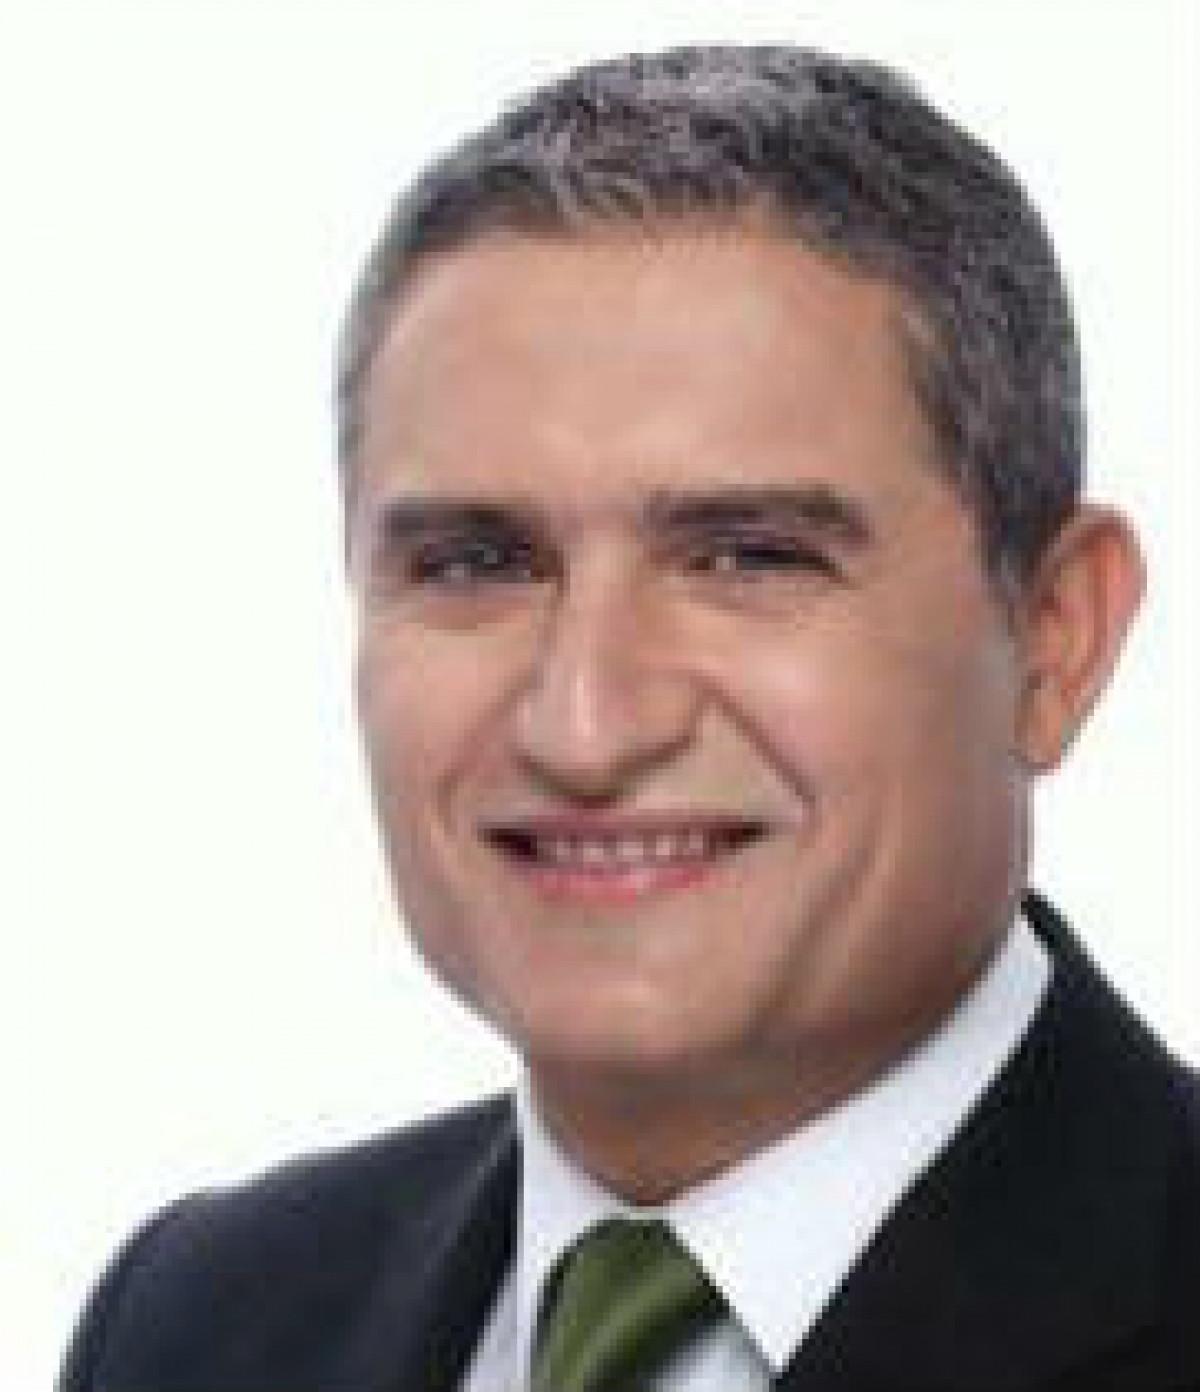 Manuel Ortega Santaella